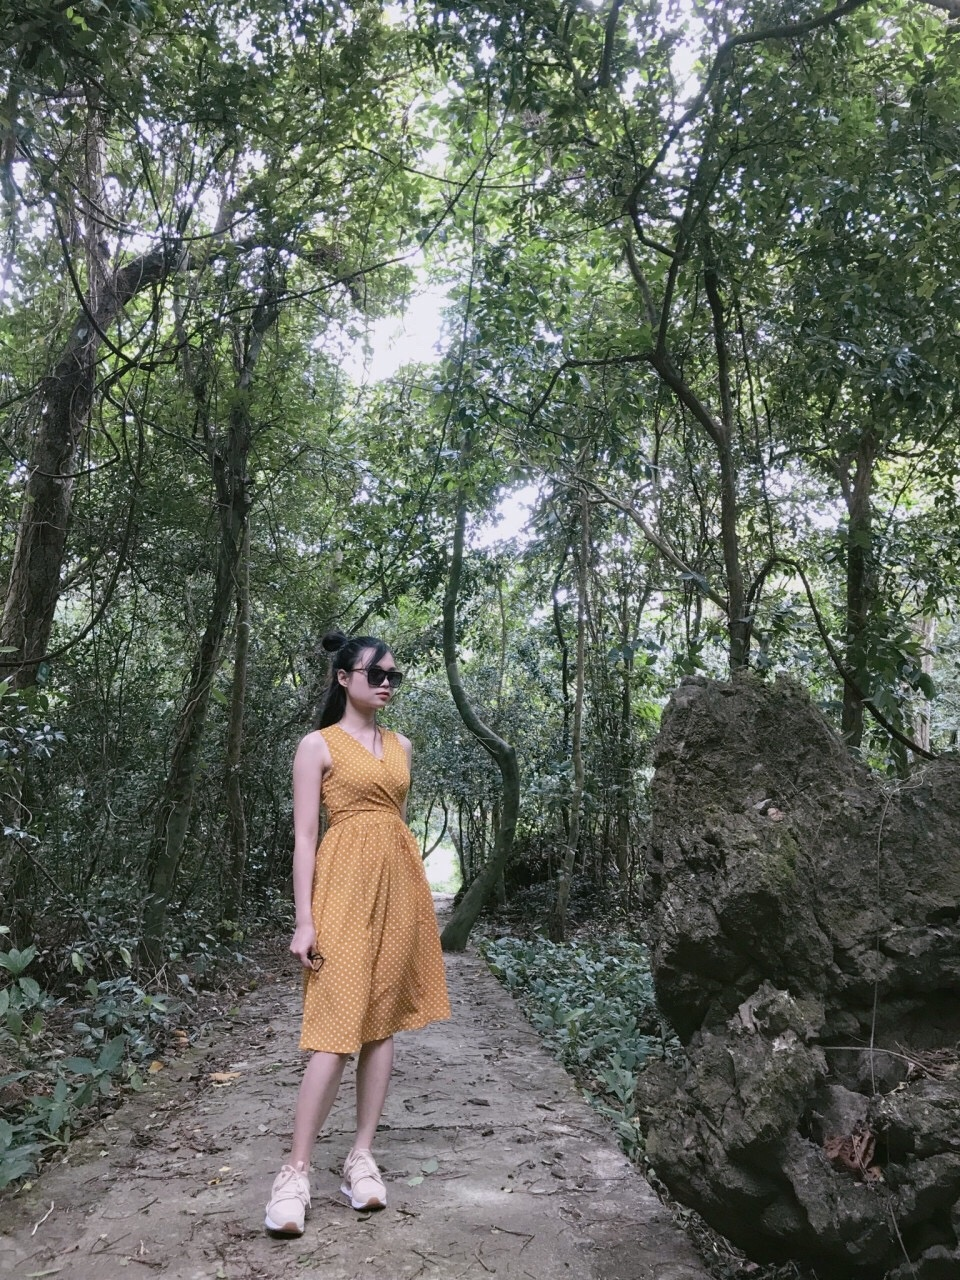 #Mytour: Quang Binh nang gio cho mua he nhieu trai nghiem hinh anh 12